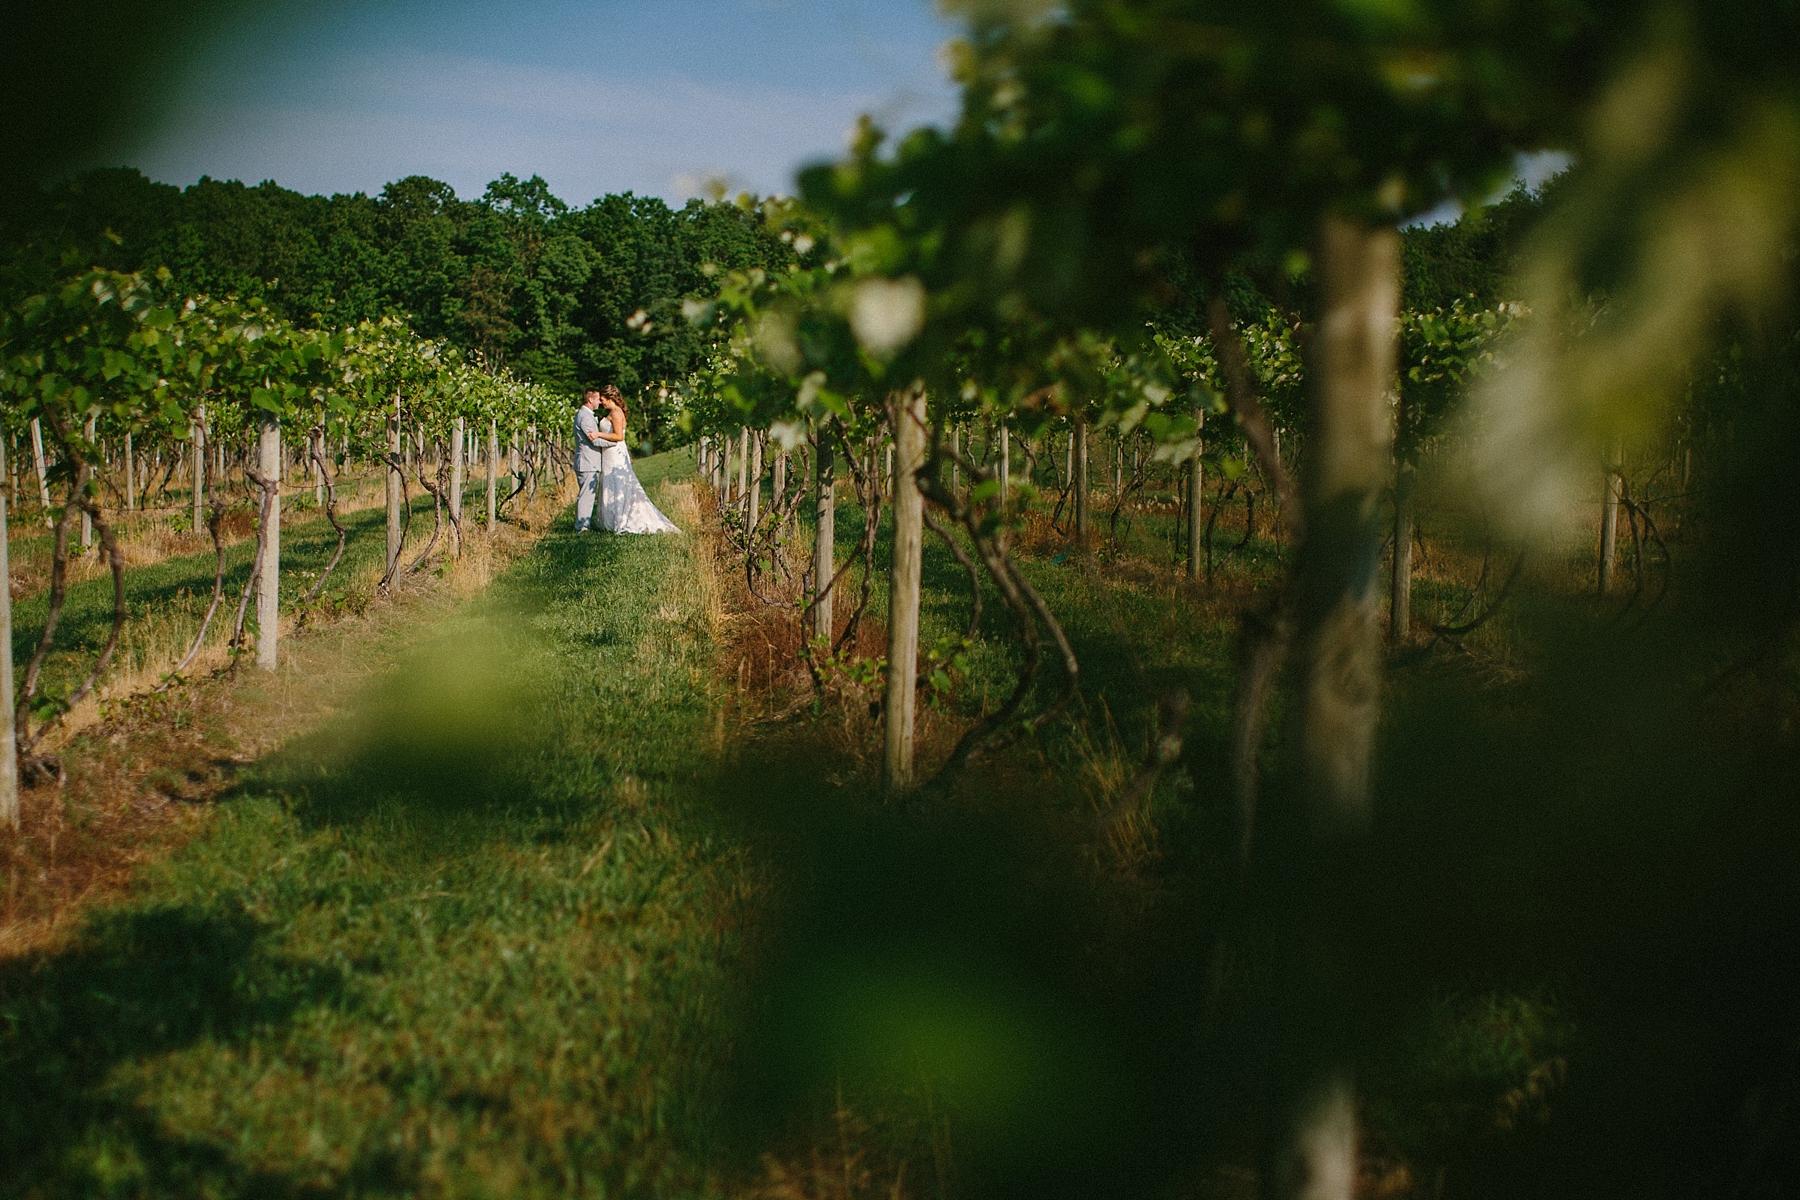 farm-wedding-engagement-session-destination-intimate_0039.jpg